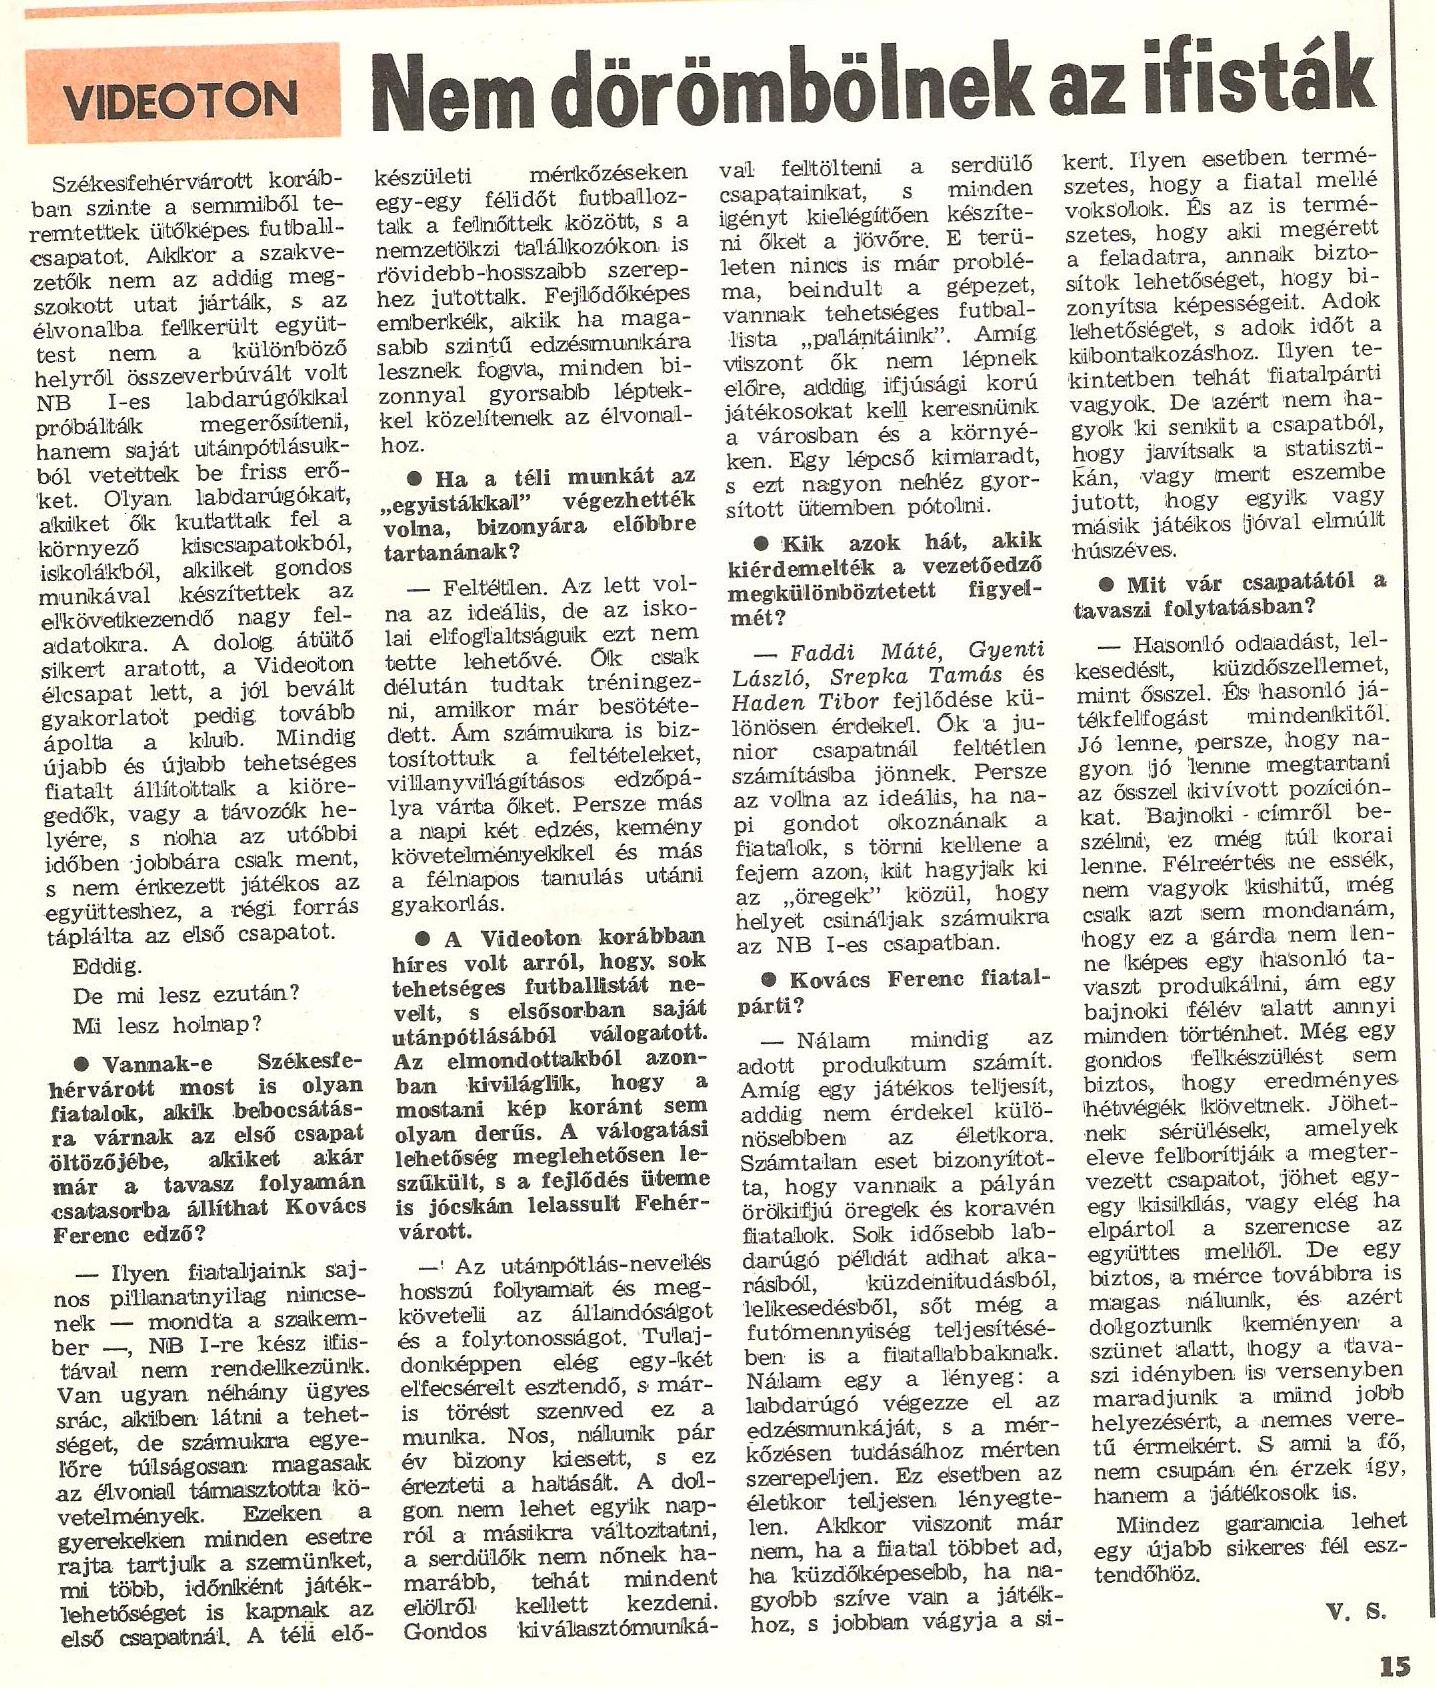 Idokapszula_1983-84_Teliszunet_bevetes_elott_Videoton_1.jpg